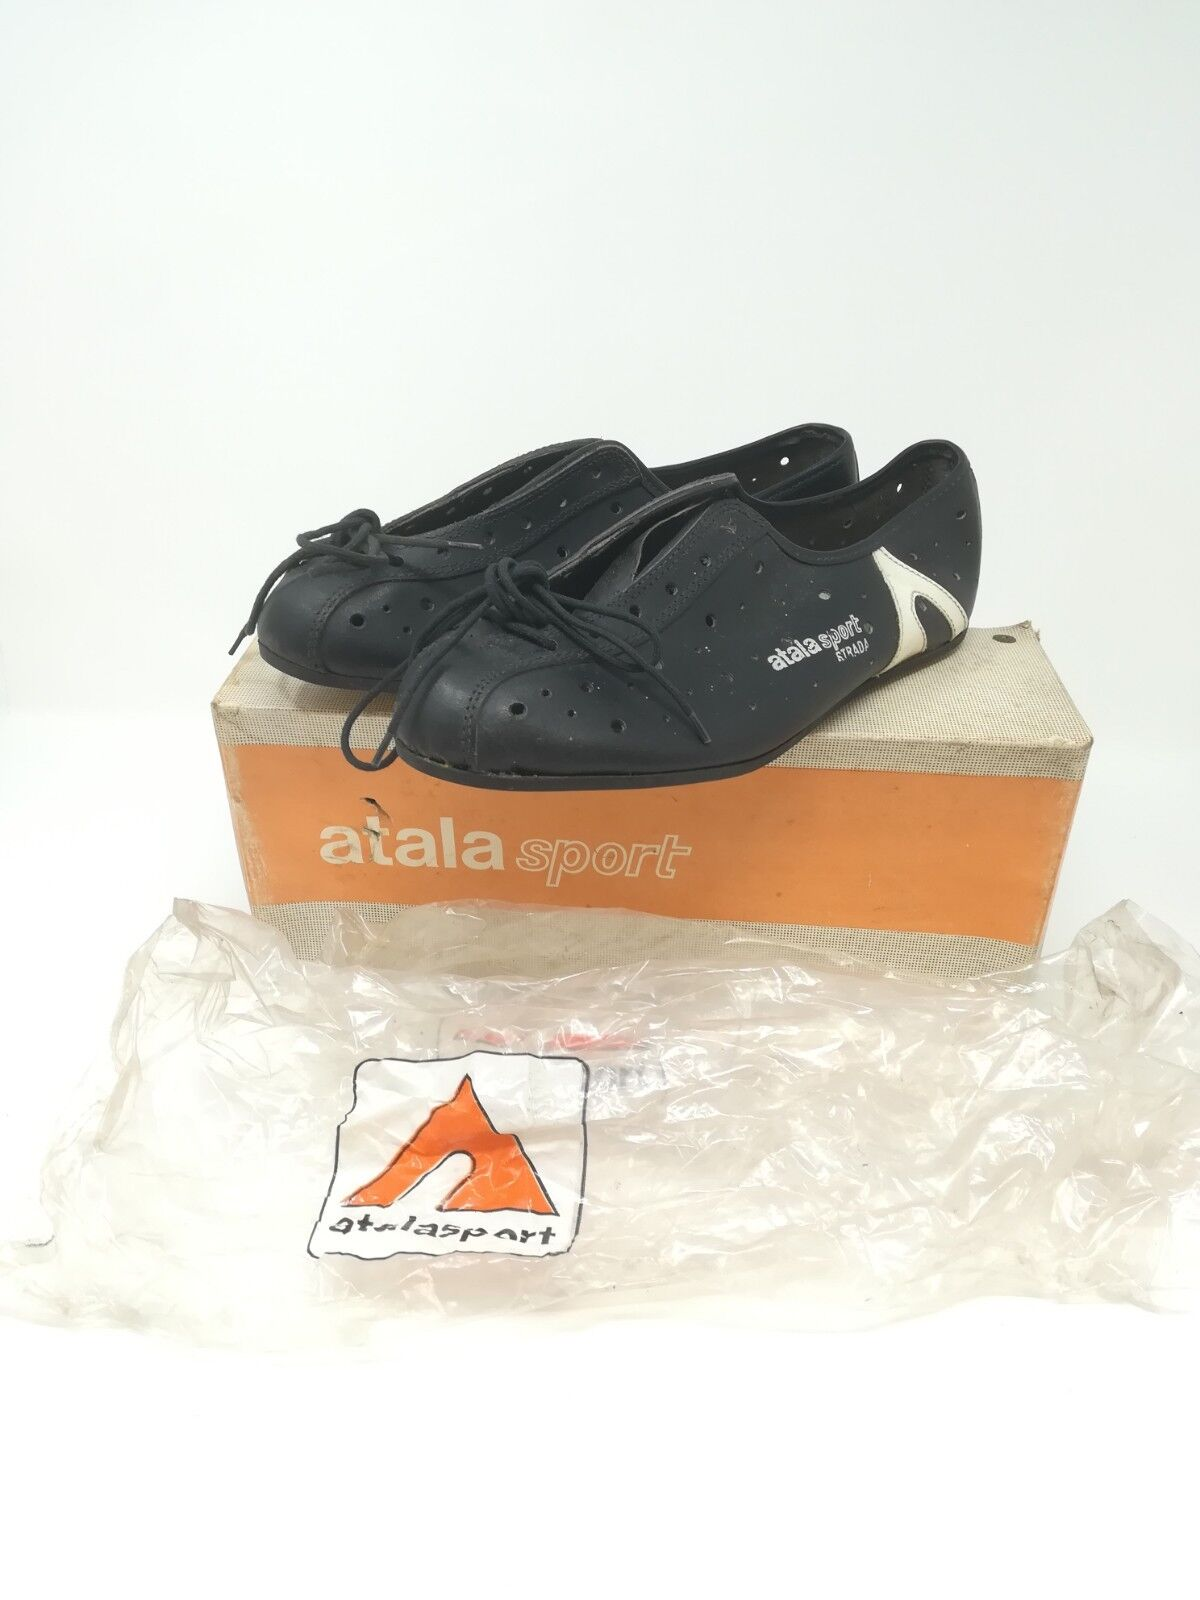 Vintage scarpe ciclismo cycling scarpe  Atala sport Strada  39 NOS